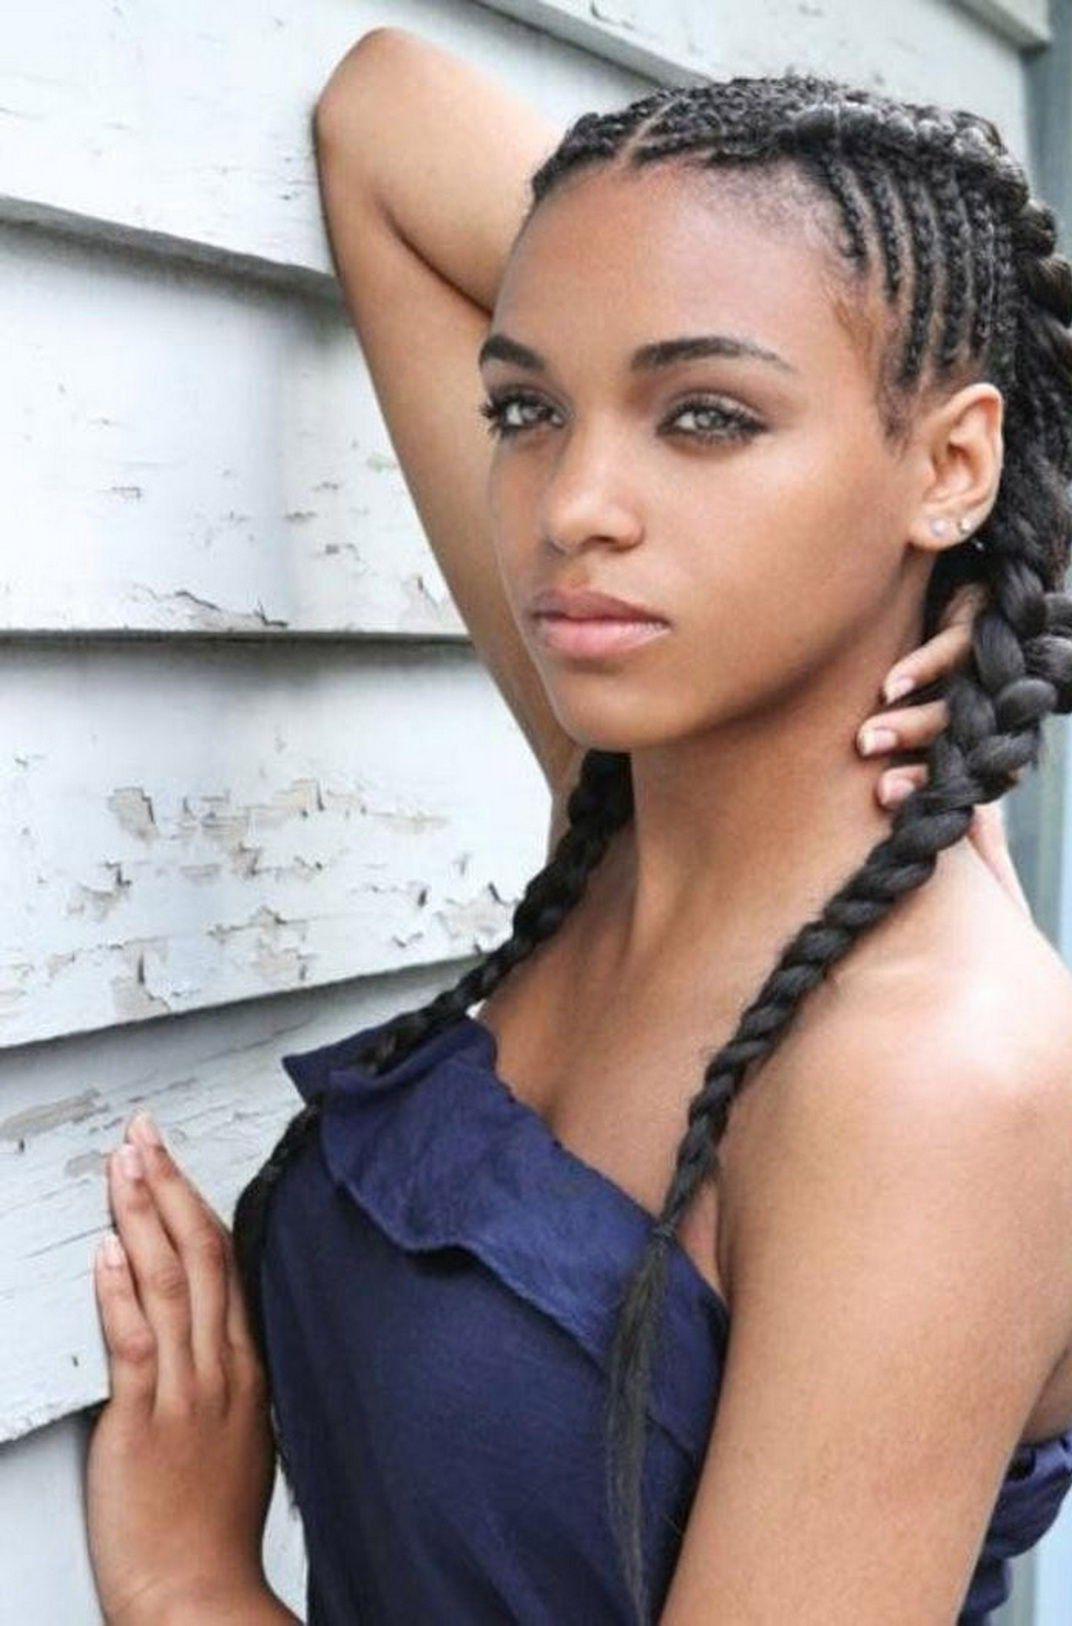 Hairstyles For Black Teenage Girls For School | Skveleweby Pertaining To Cute Short Hairstyles For Black Teenage Girls (View 5 of 25)